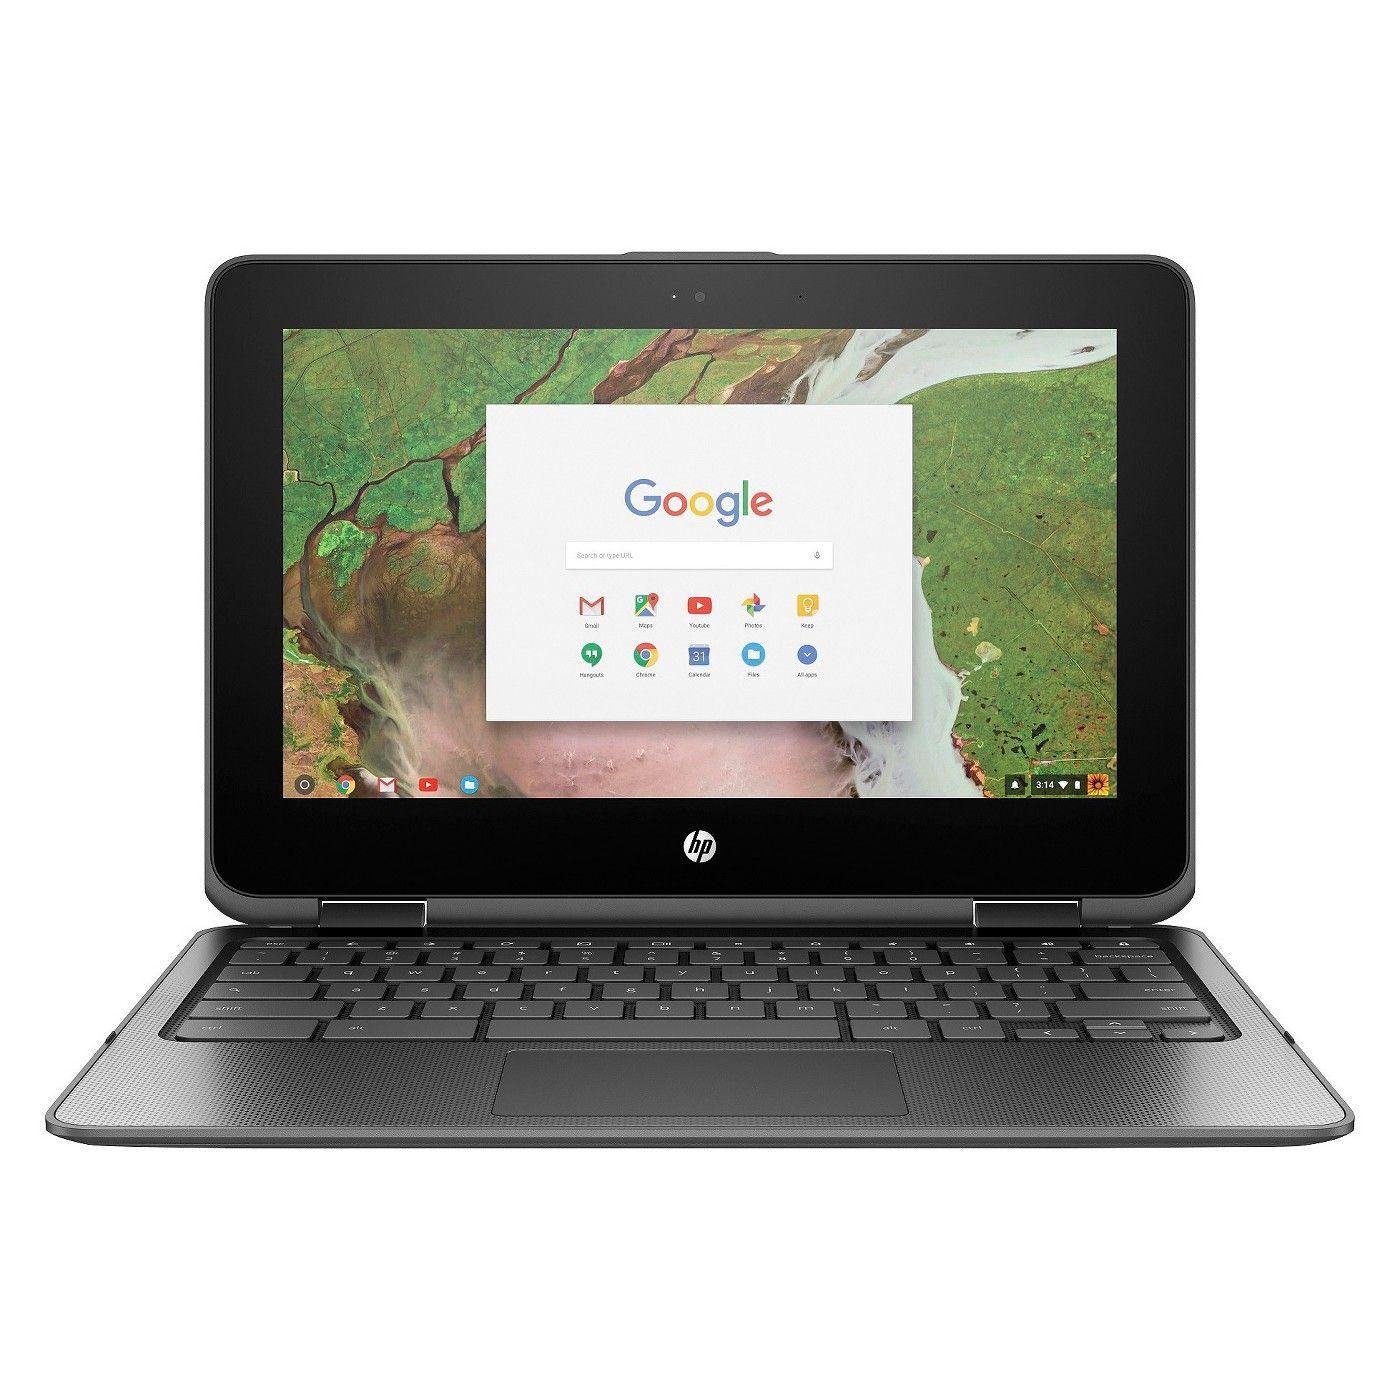 Affiliate ad, Hp chromebook, Chromebook, Flash memory